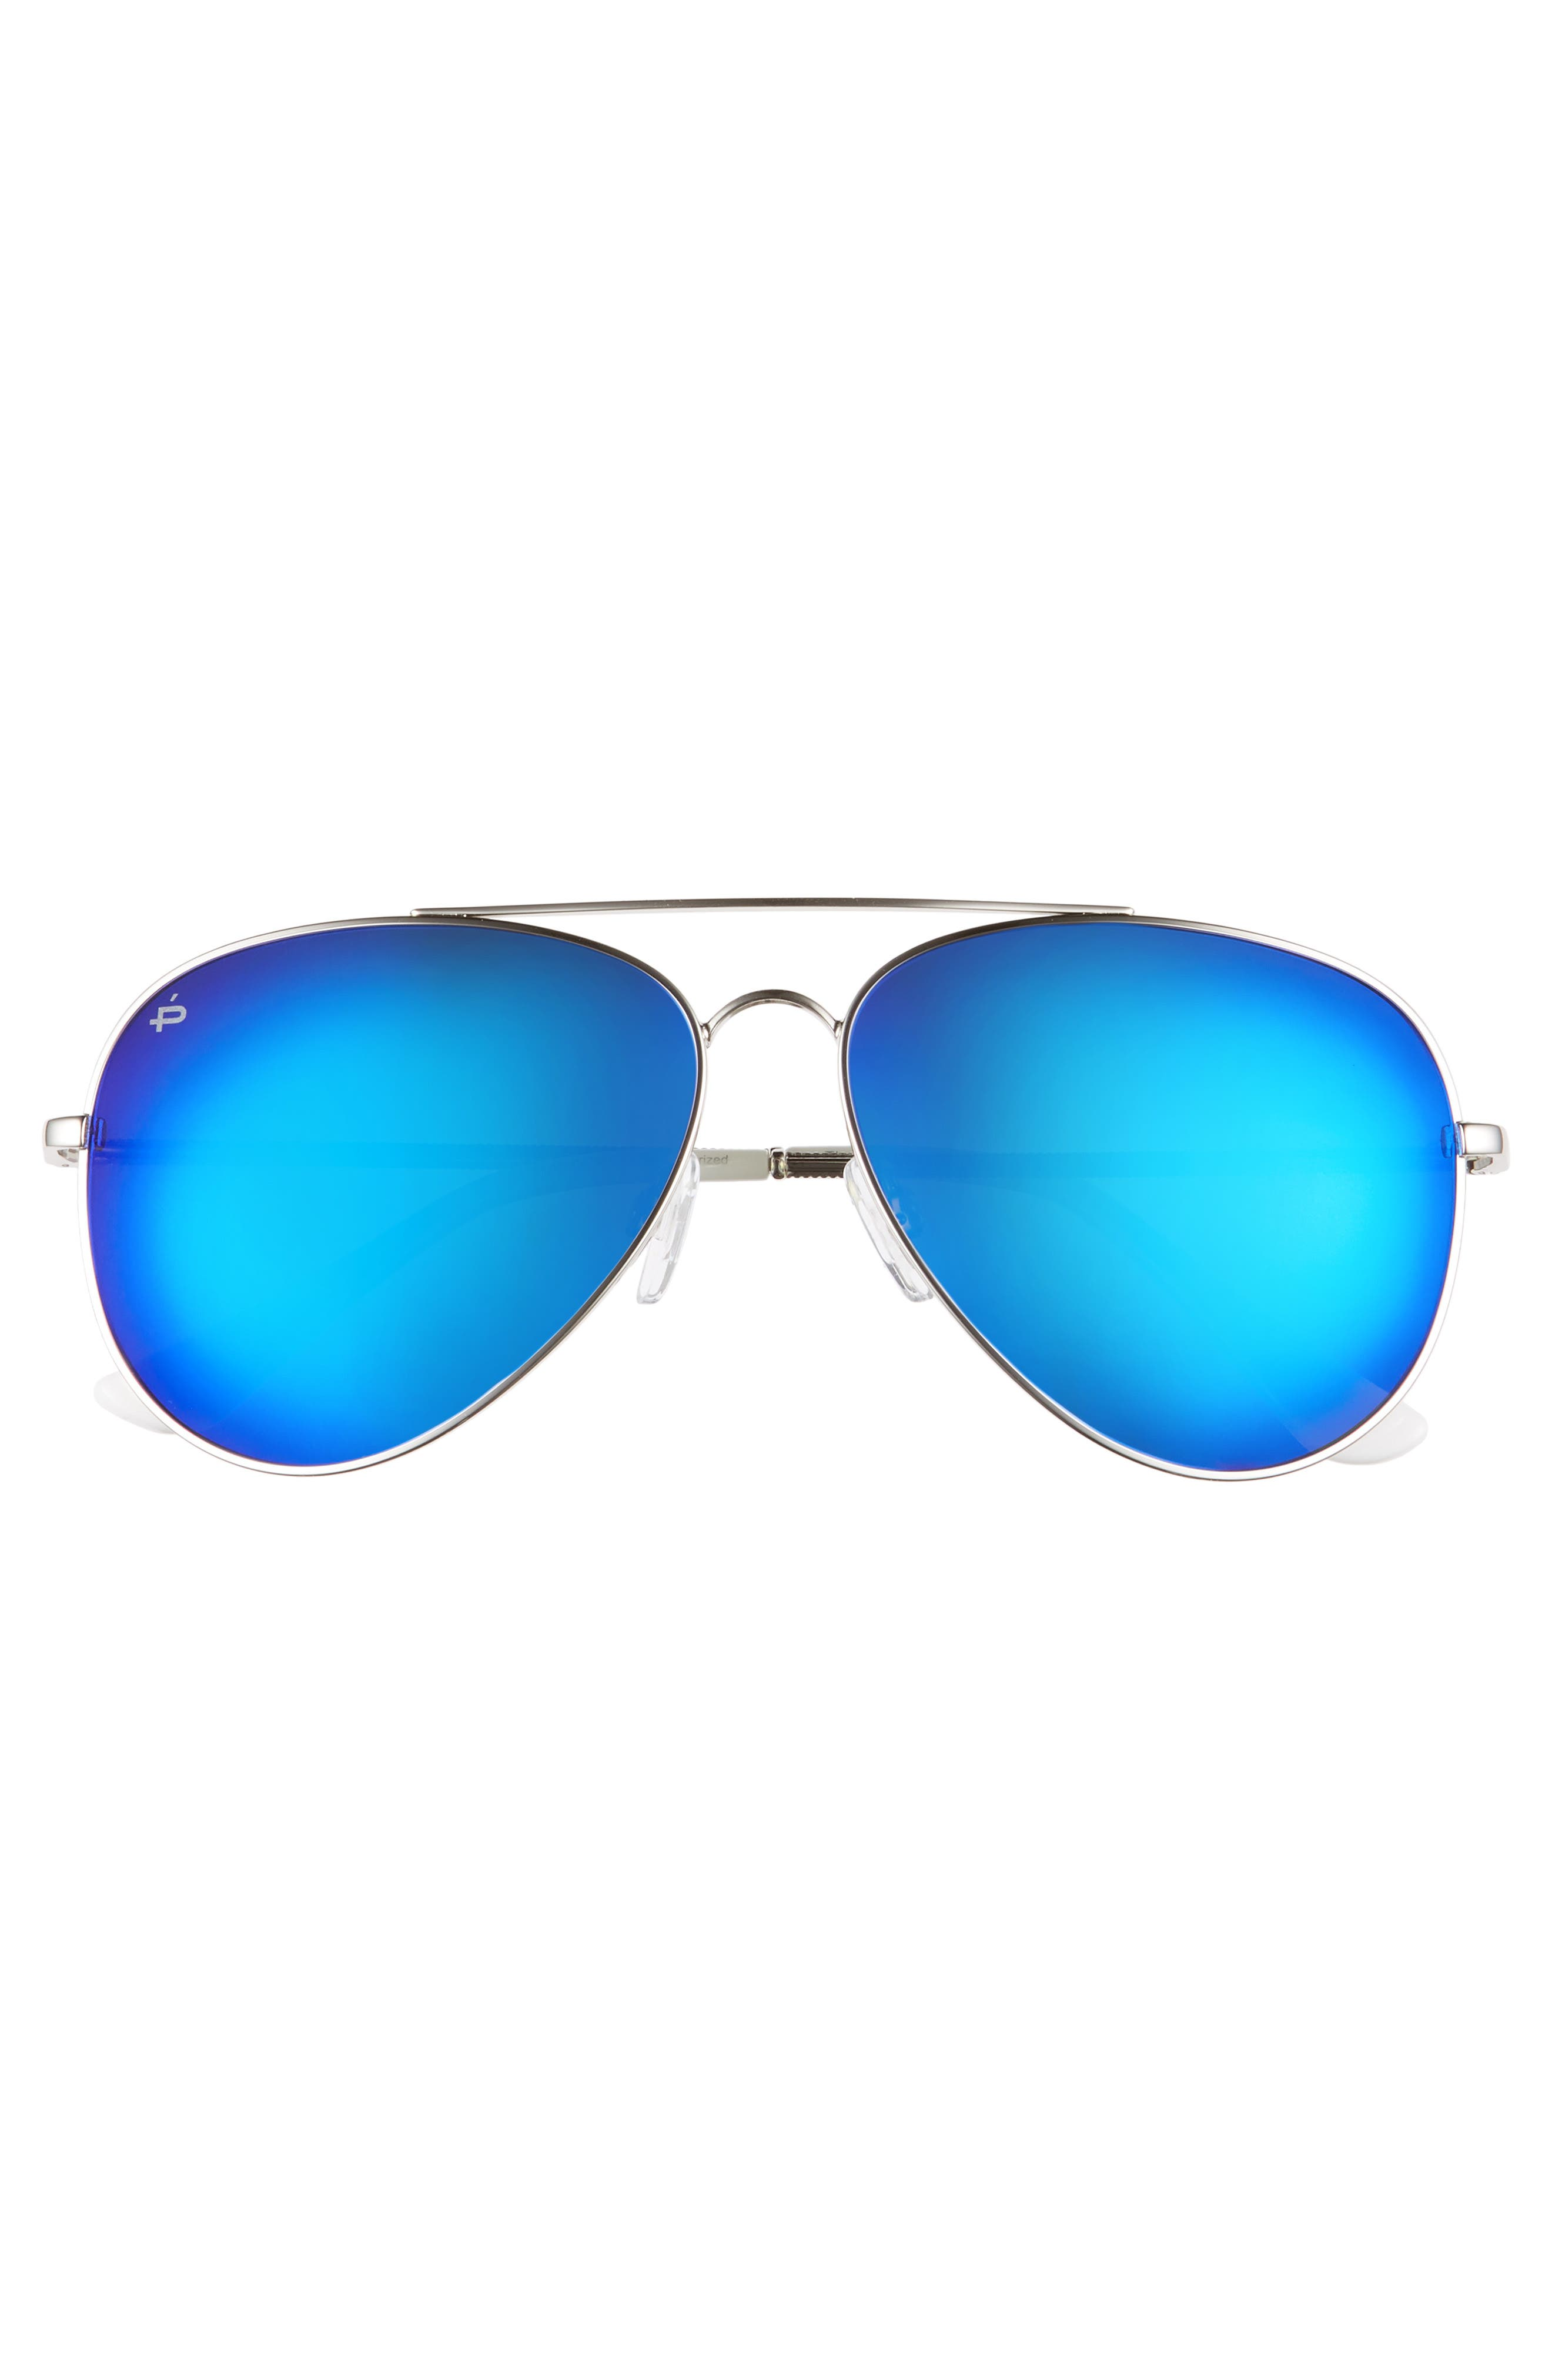 Privé Revaux The Cali Polarized 59mm Sunglasses,                             Alternate thumbnail 3, color,                             NICKEL SILVER